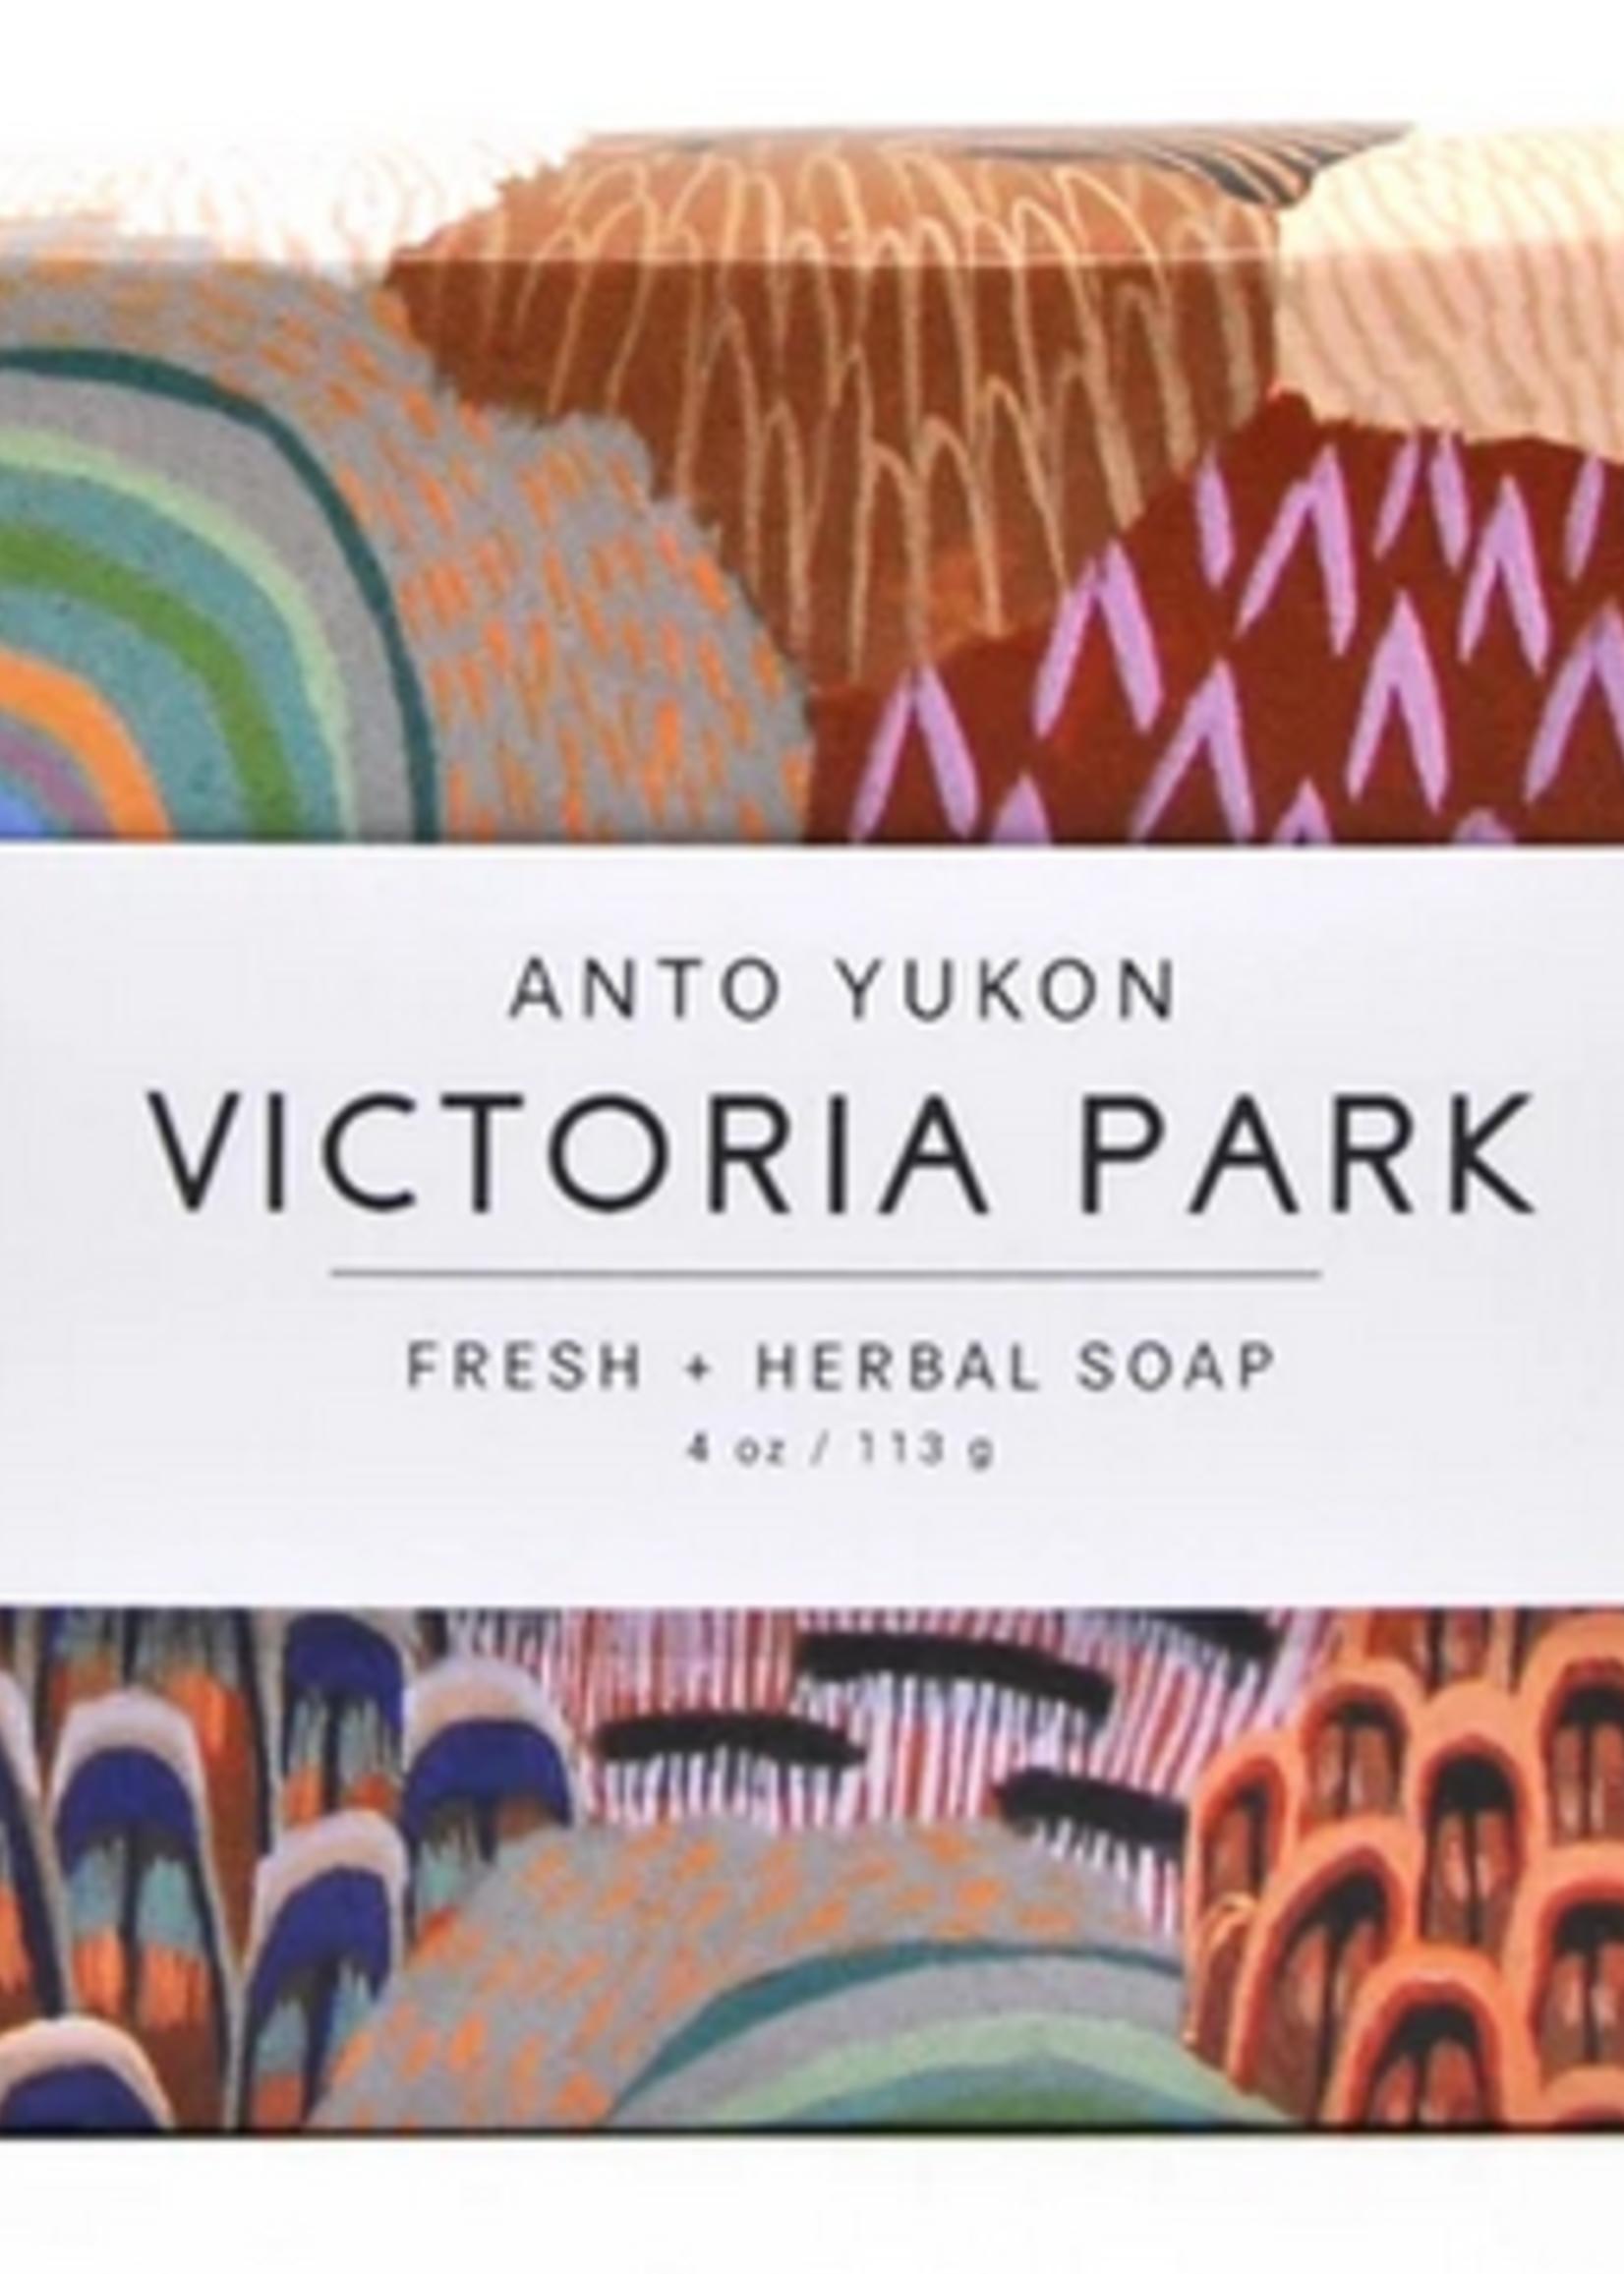 Anto Yukon Anto Yukon - Victoria Park Soap